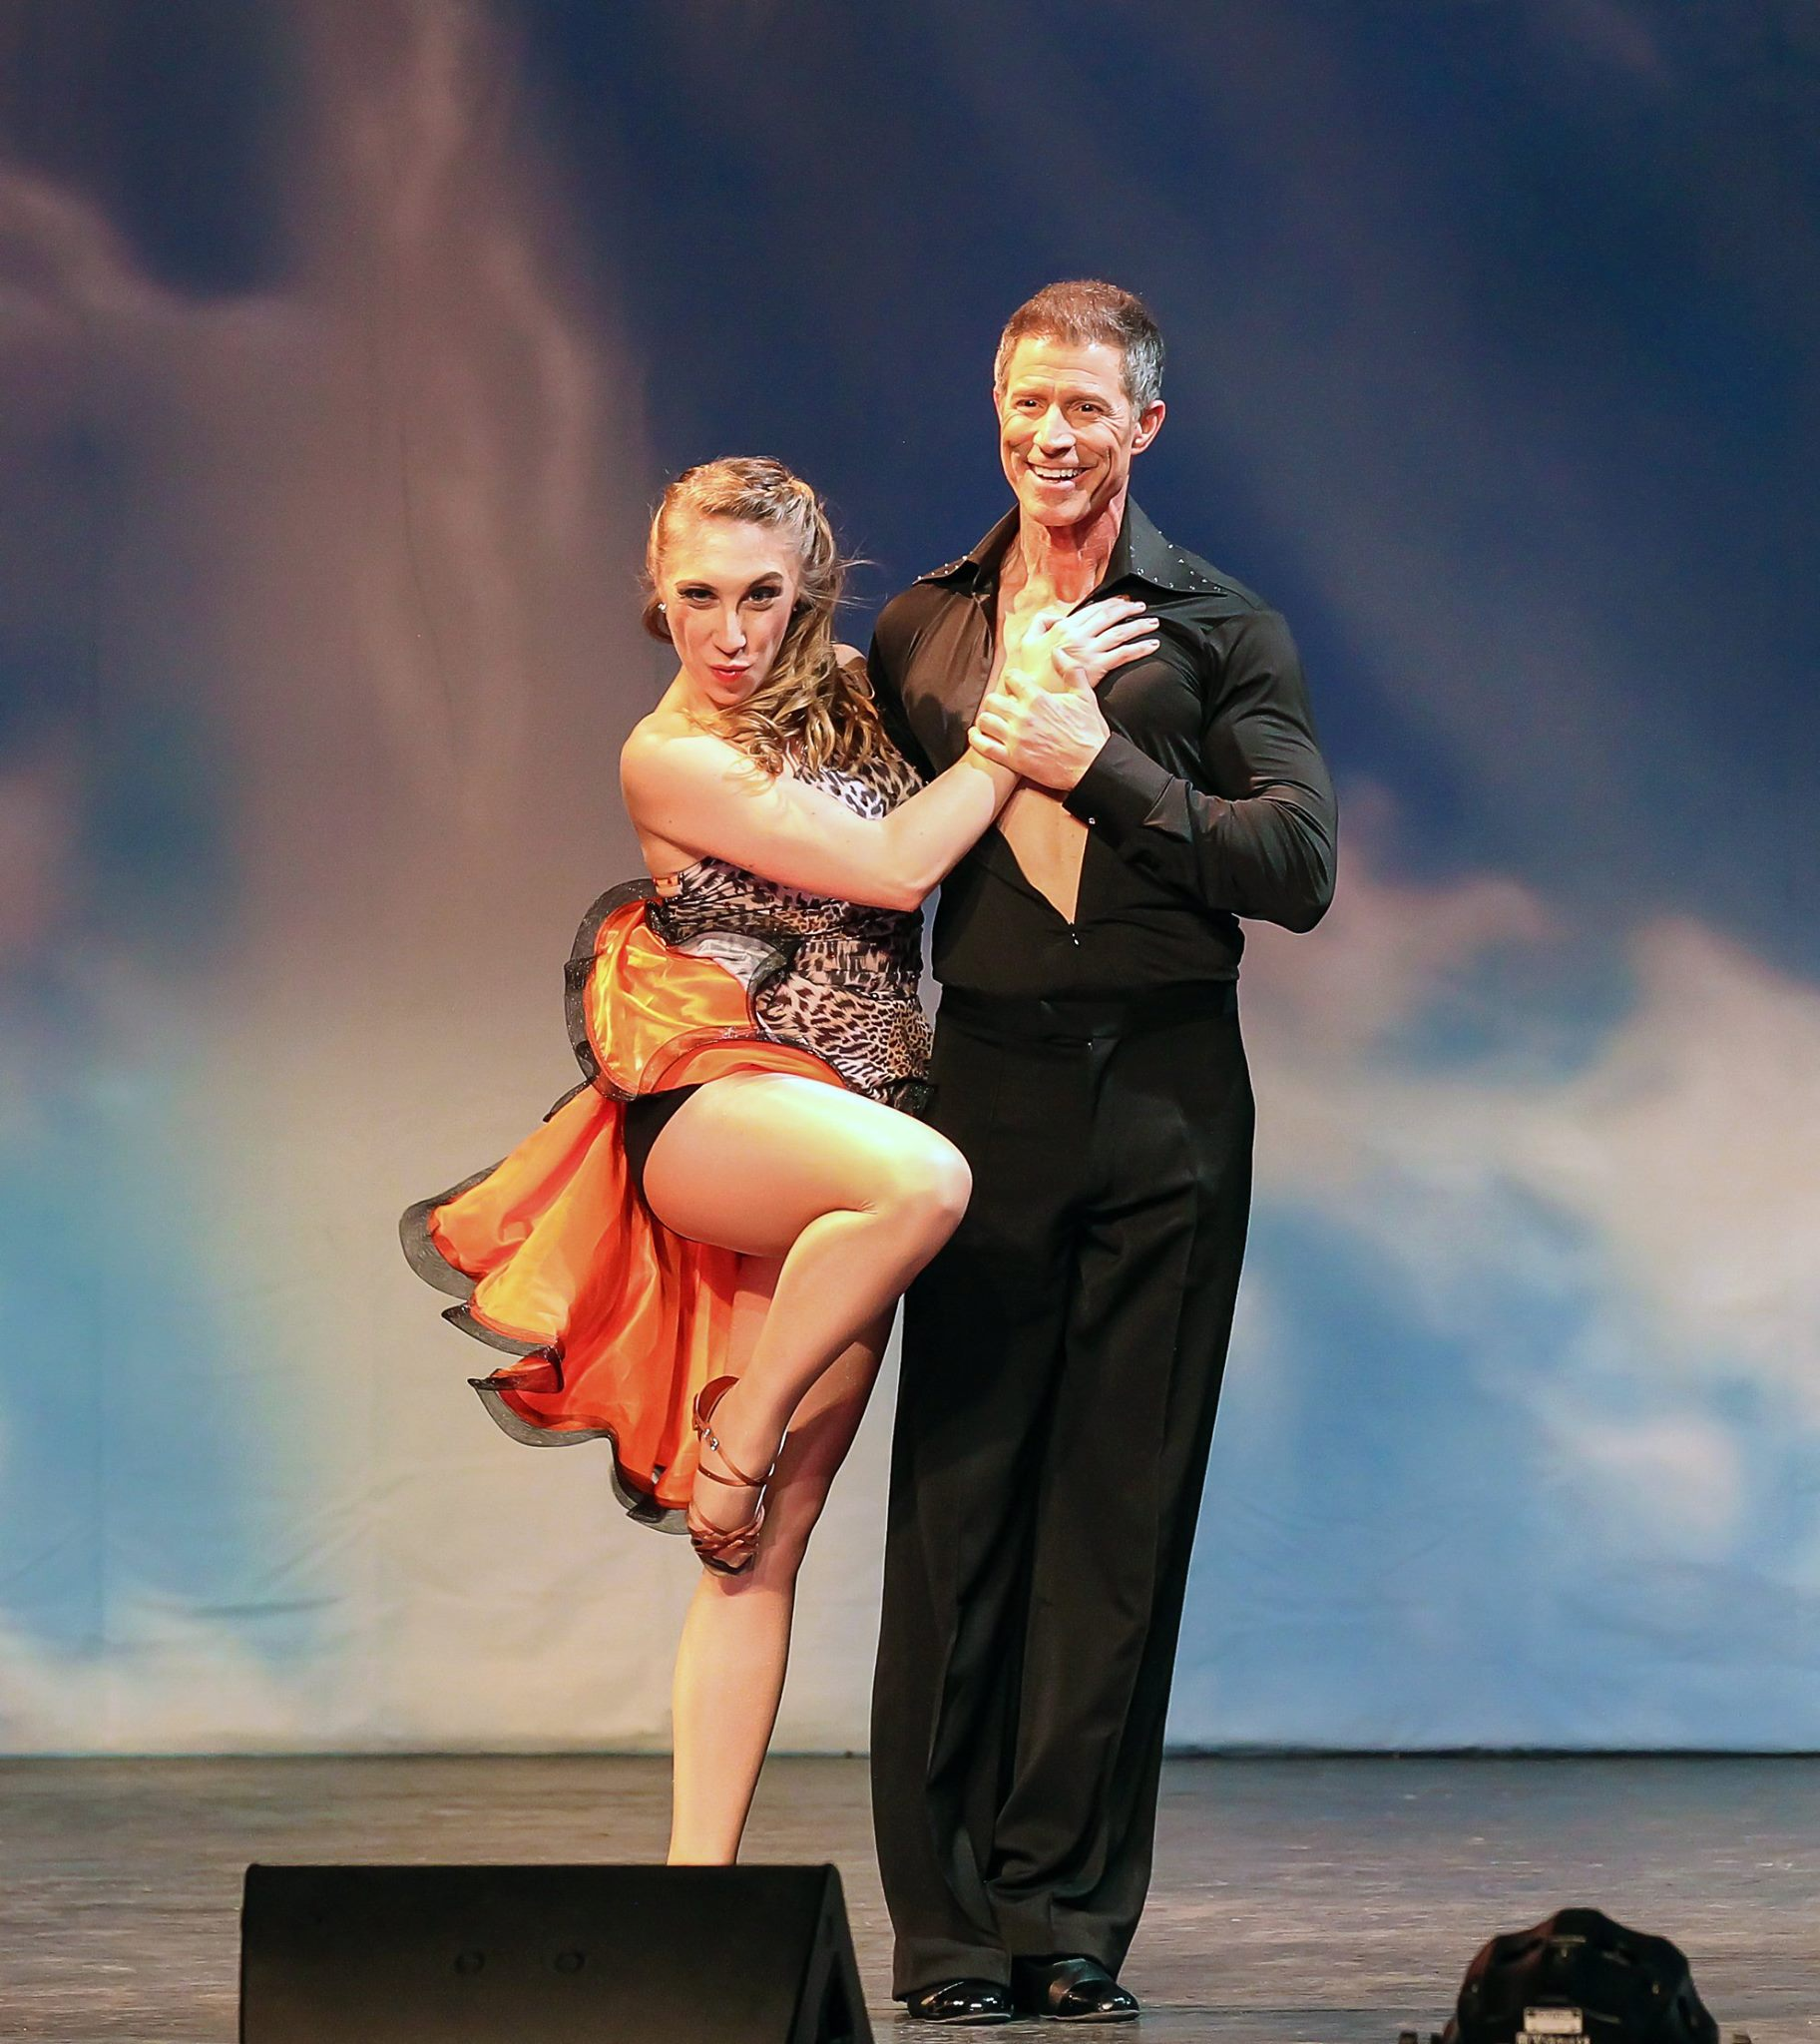 Samba -Dancing With the Rogue Valley Stars 2015